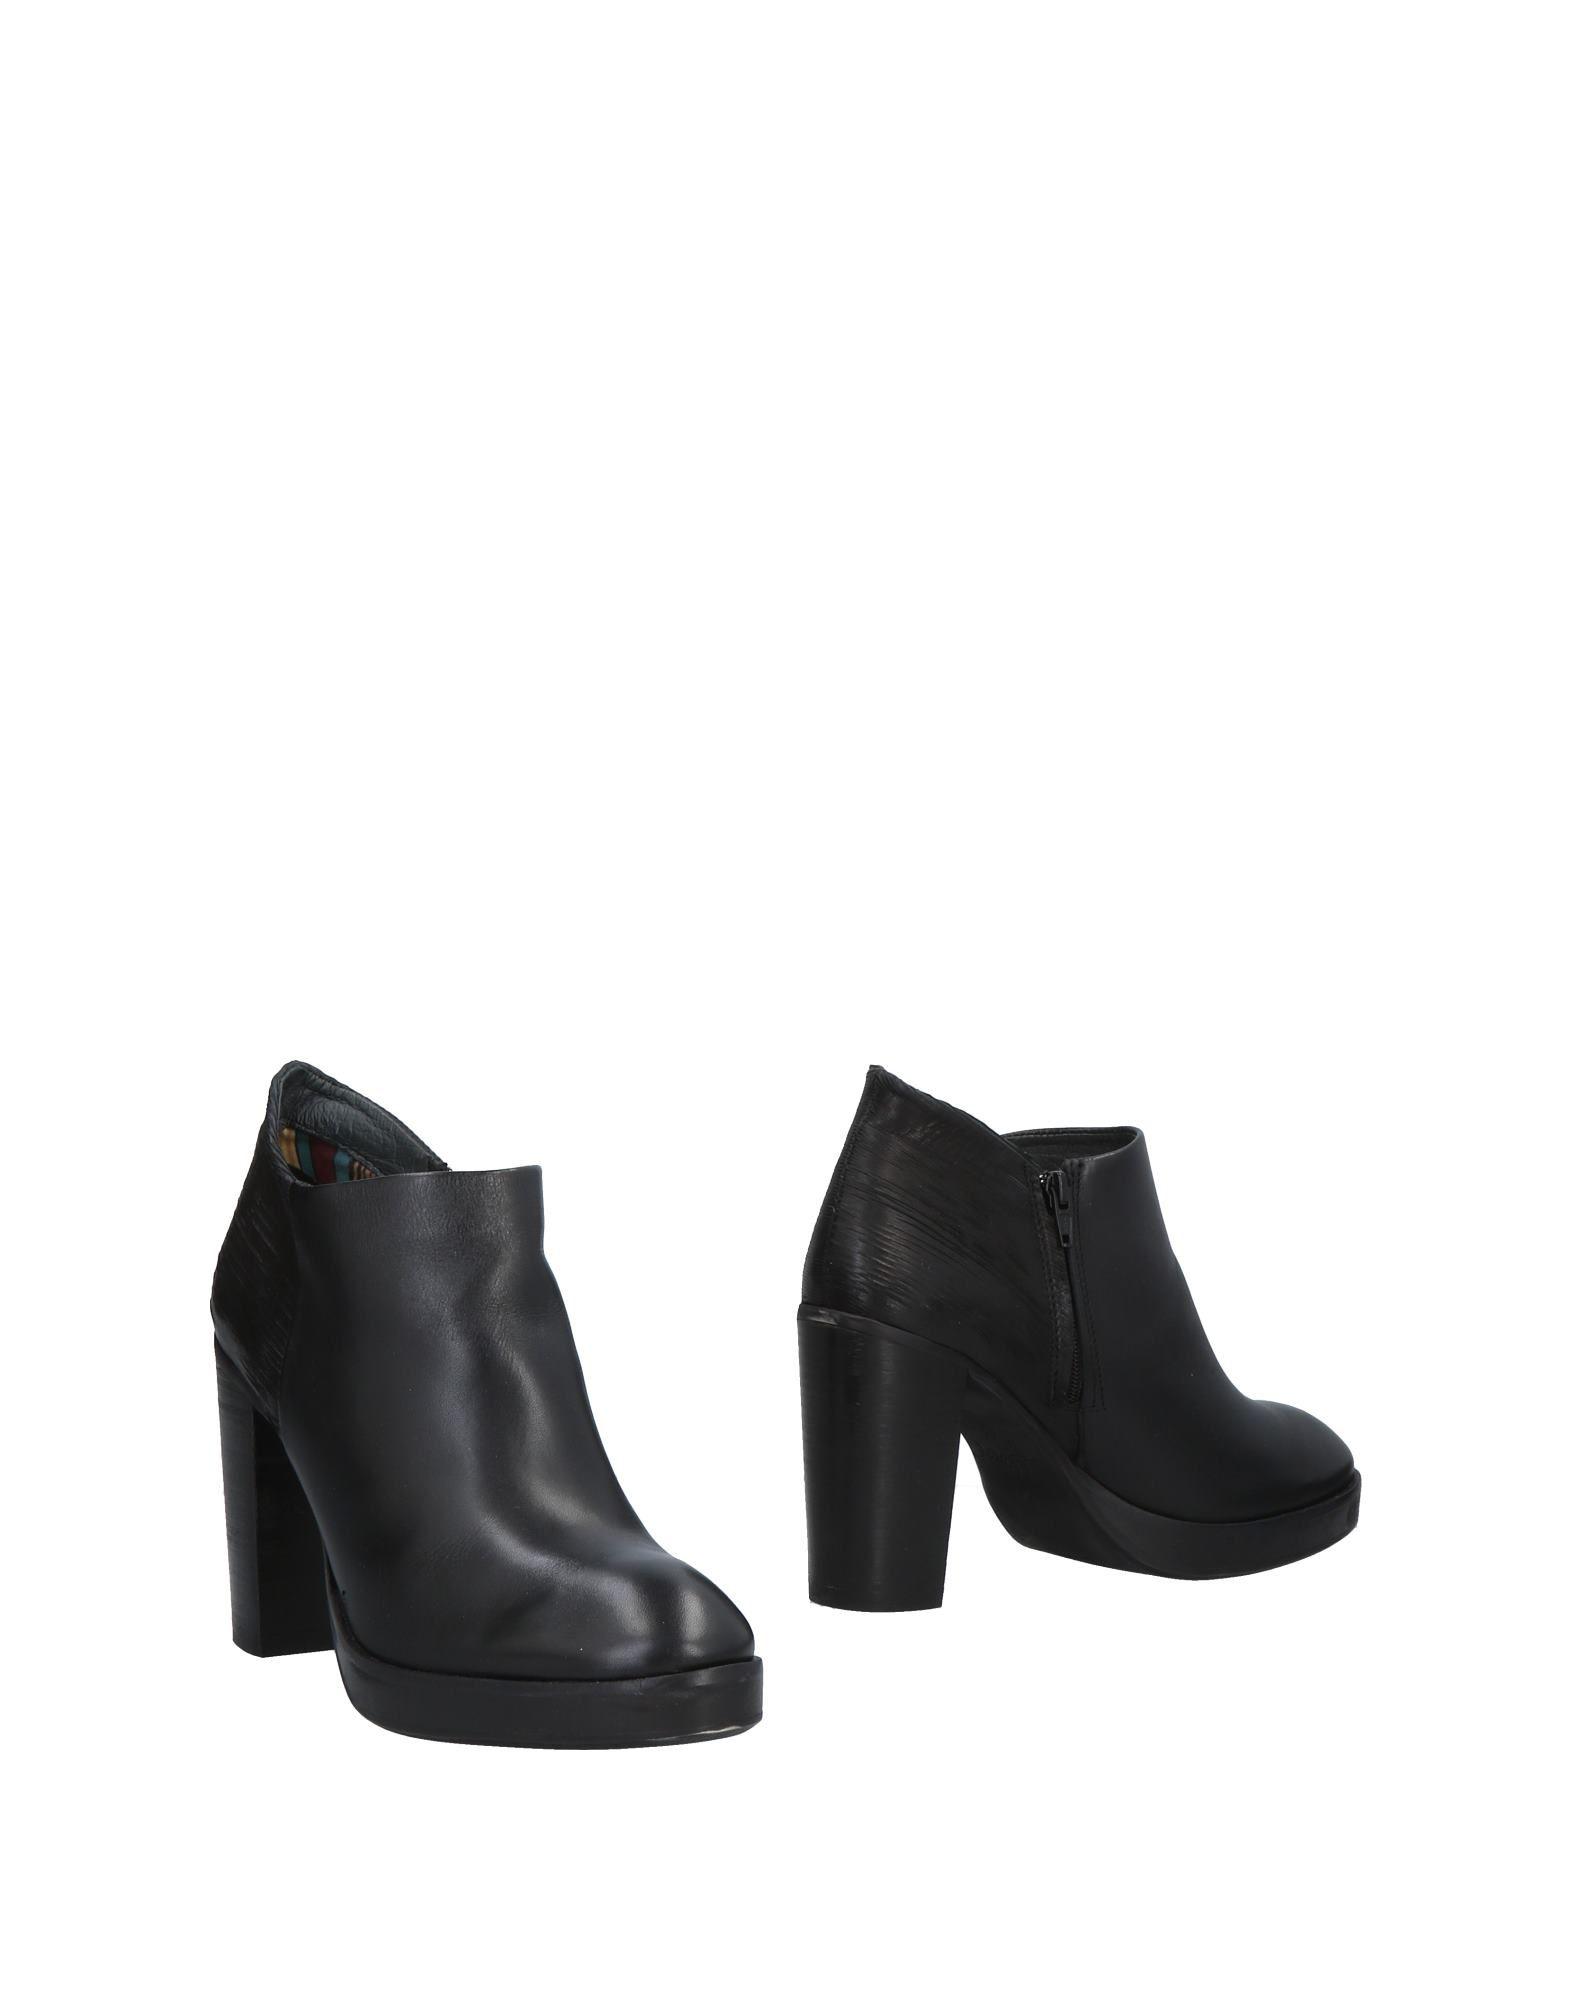 Felmini Stiefelette Damen  11486184JJ Gute Qualität beliebte Schuhe